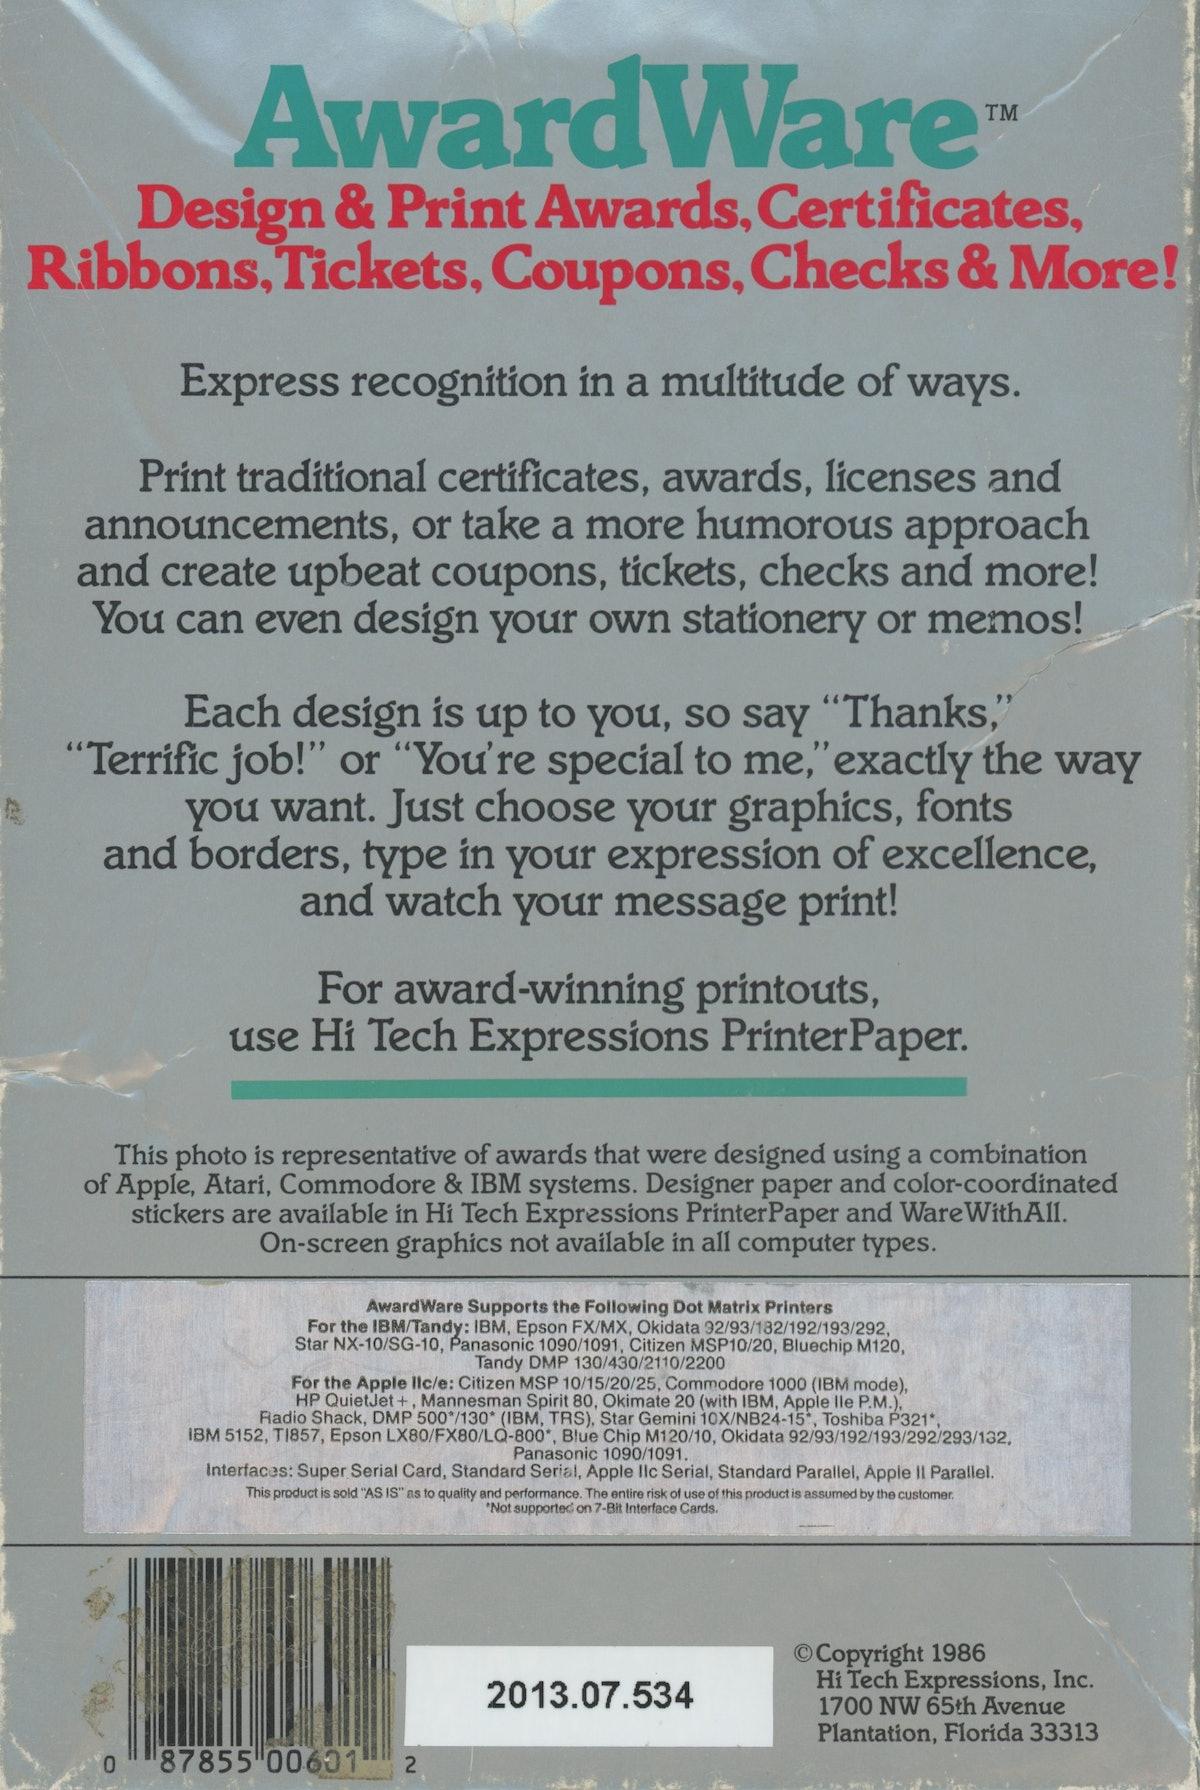 AwardWare: Design & Print Awards, Certificates, Ribbons, TIckets, Coupons, Checks & More!